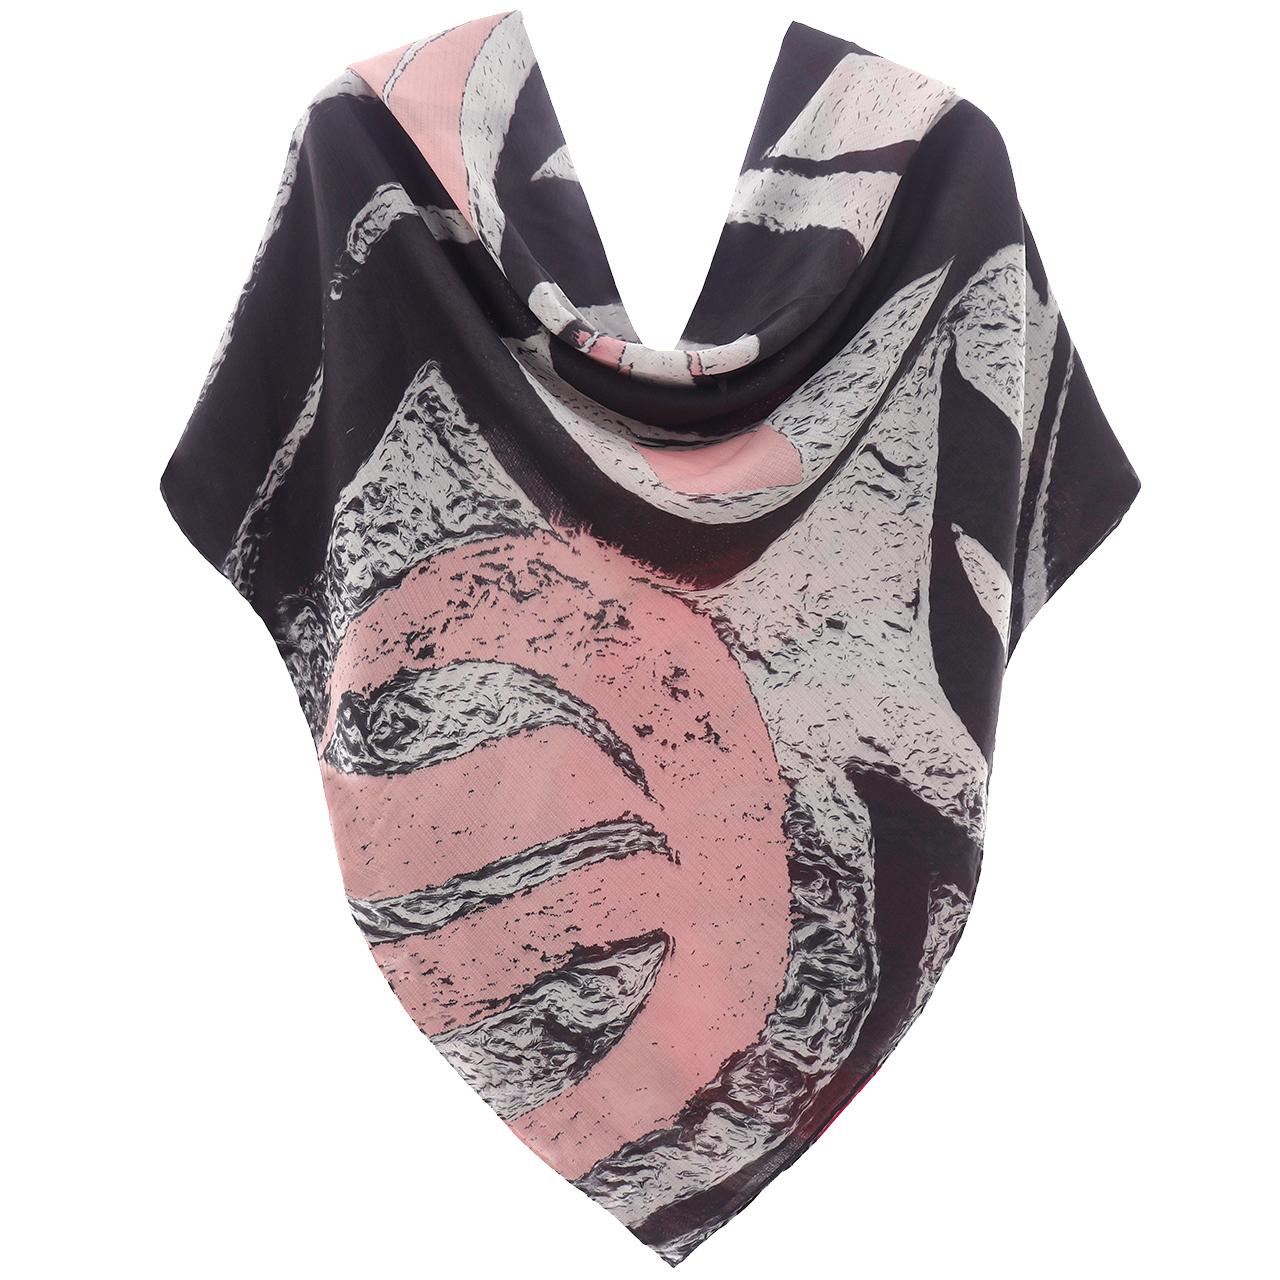 روسری زنانه کد tp-4312_43